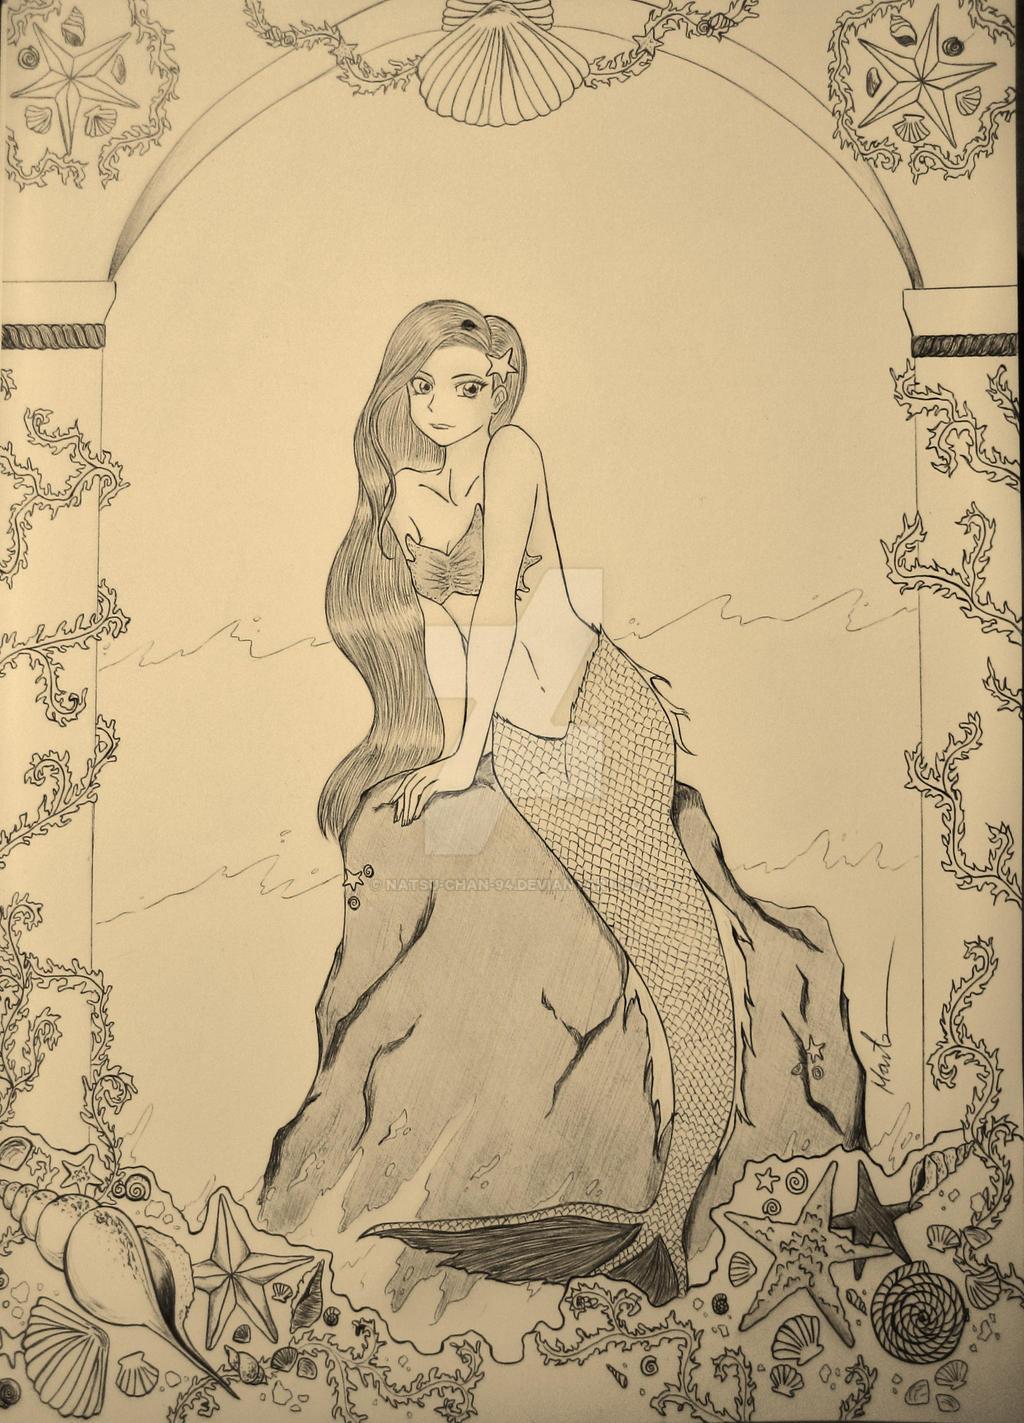 The Mermaid by Natsu-chan-94